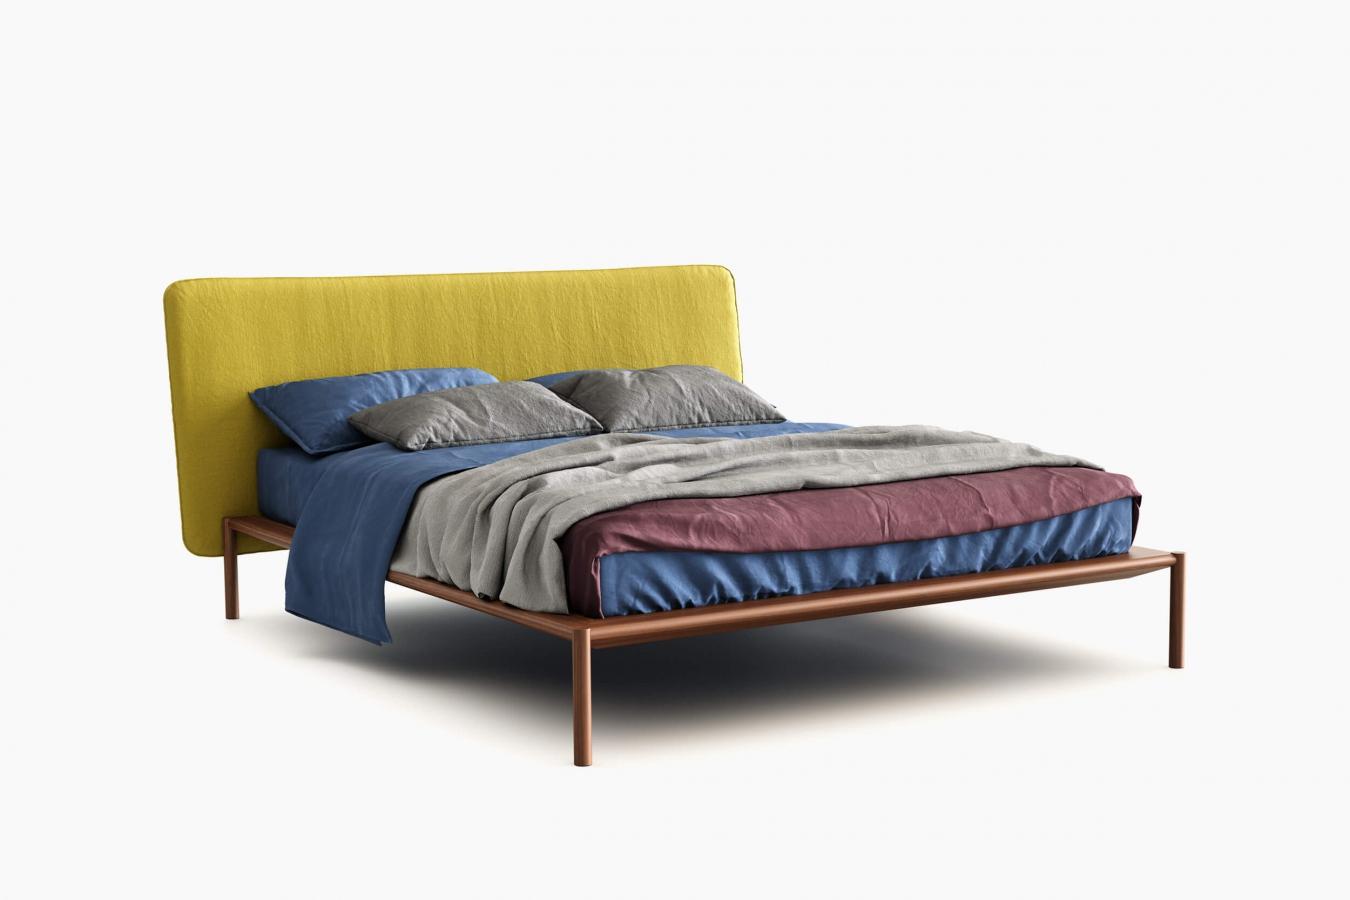 Beds Rain